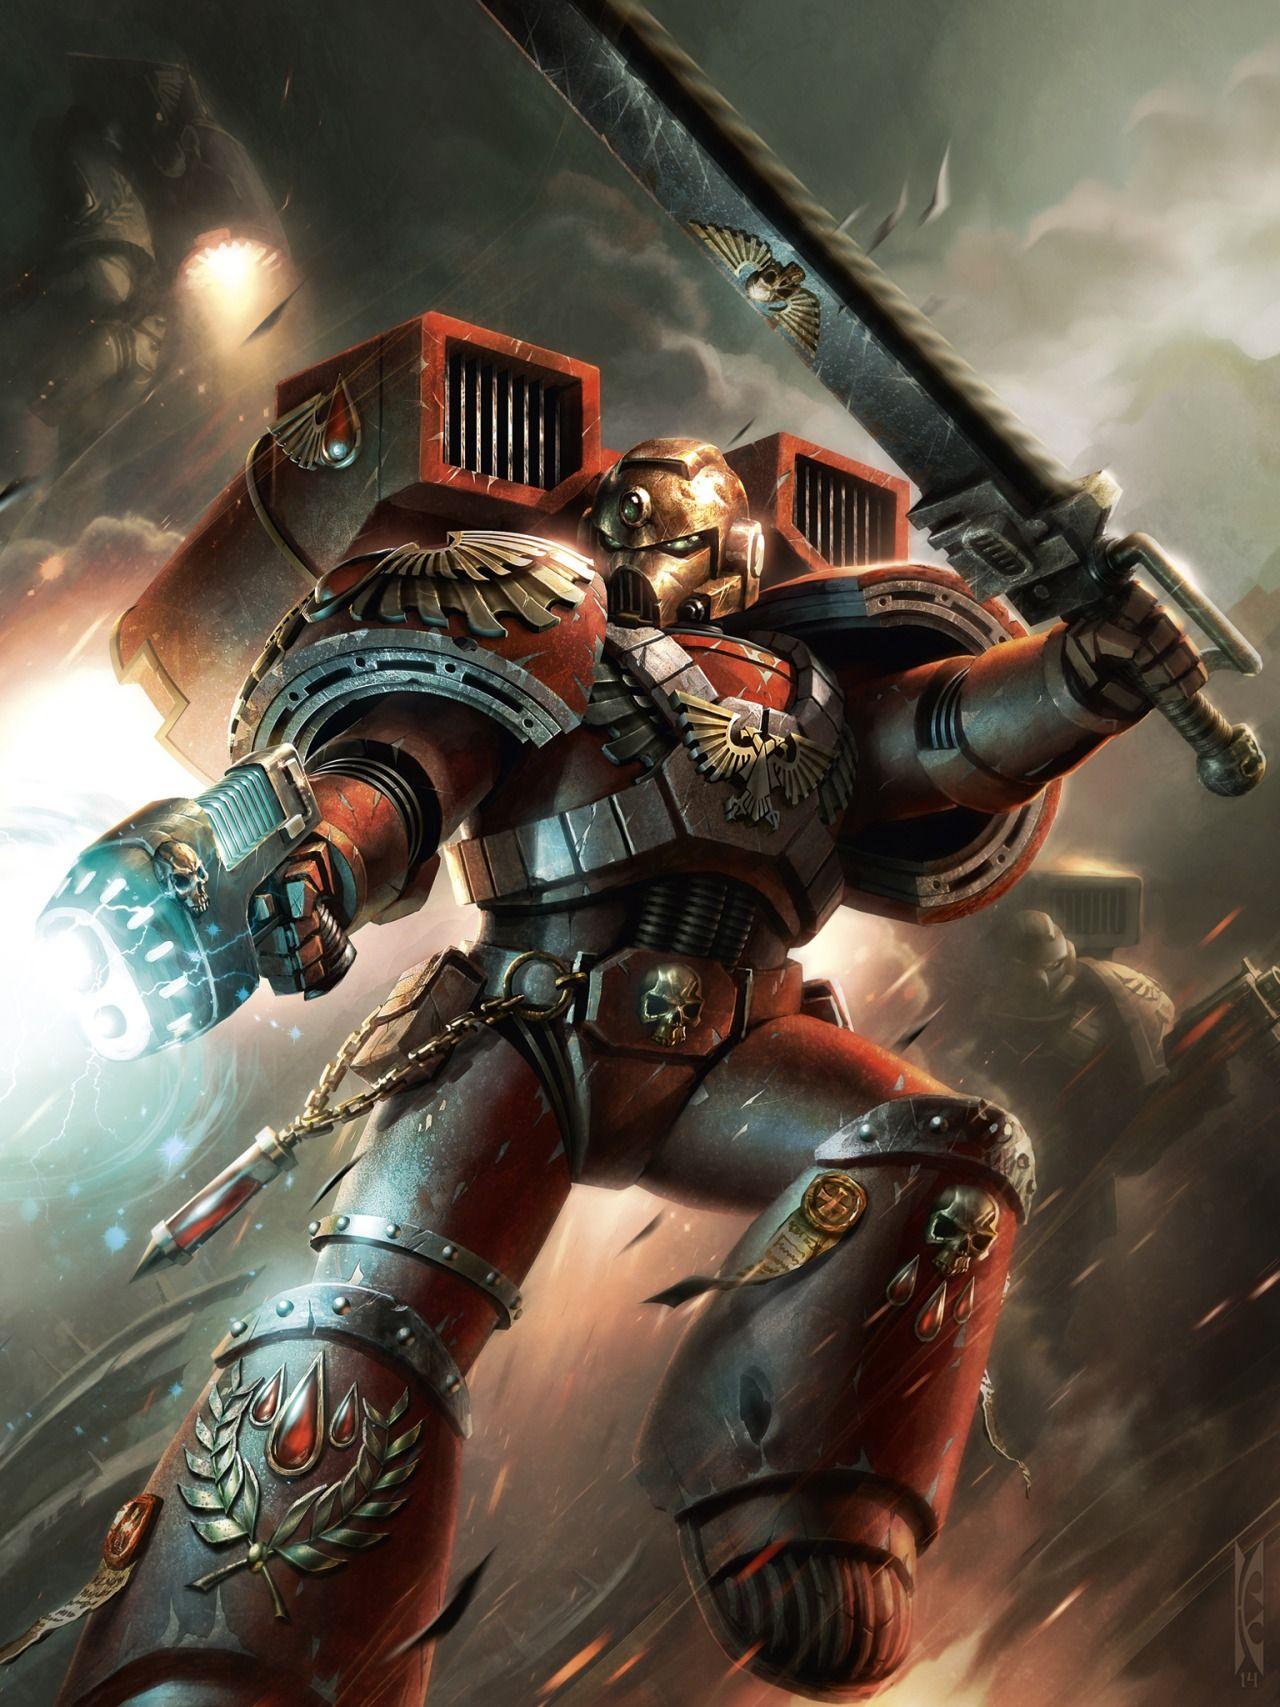 Warhammer 40k death company wallpaper - Fond Ecran Hd Wallpaper 540 Warhammer 40000warhammer Artspace Marinewarhammer 40k Blood Angelsspace